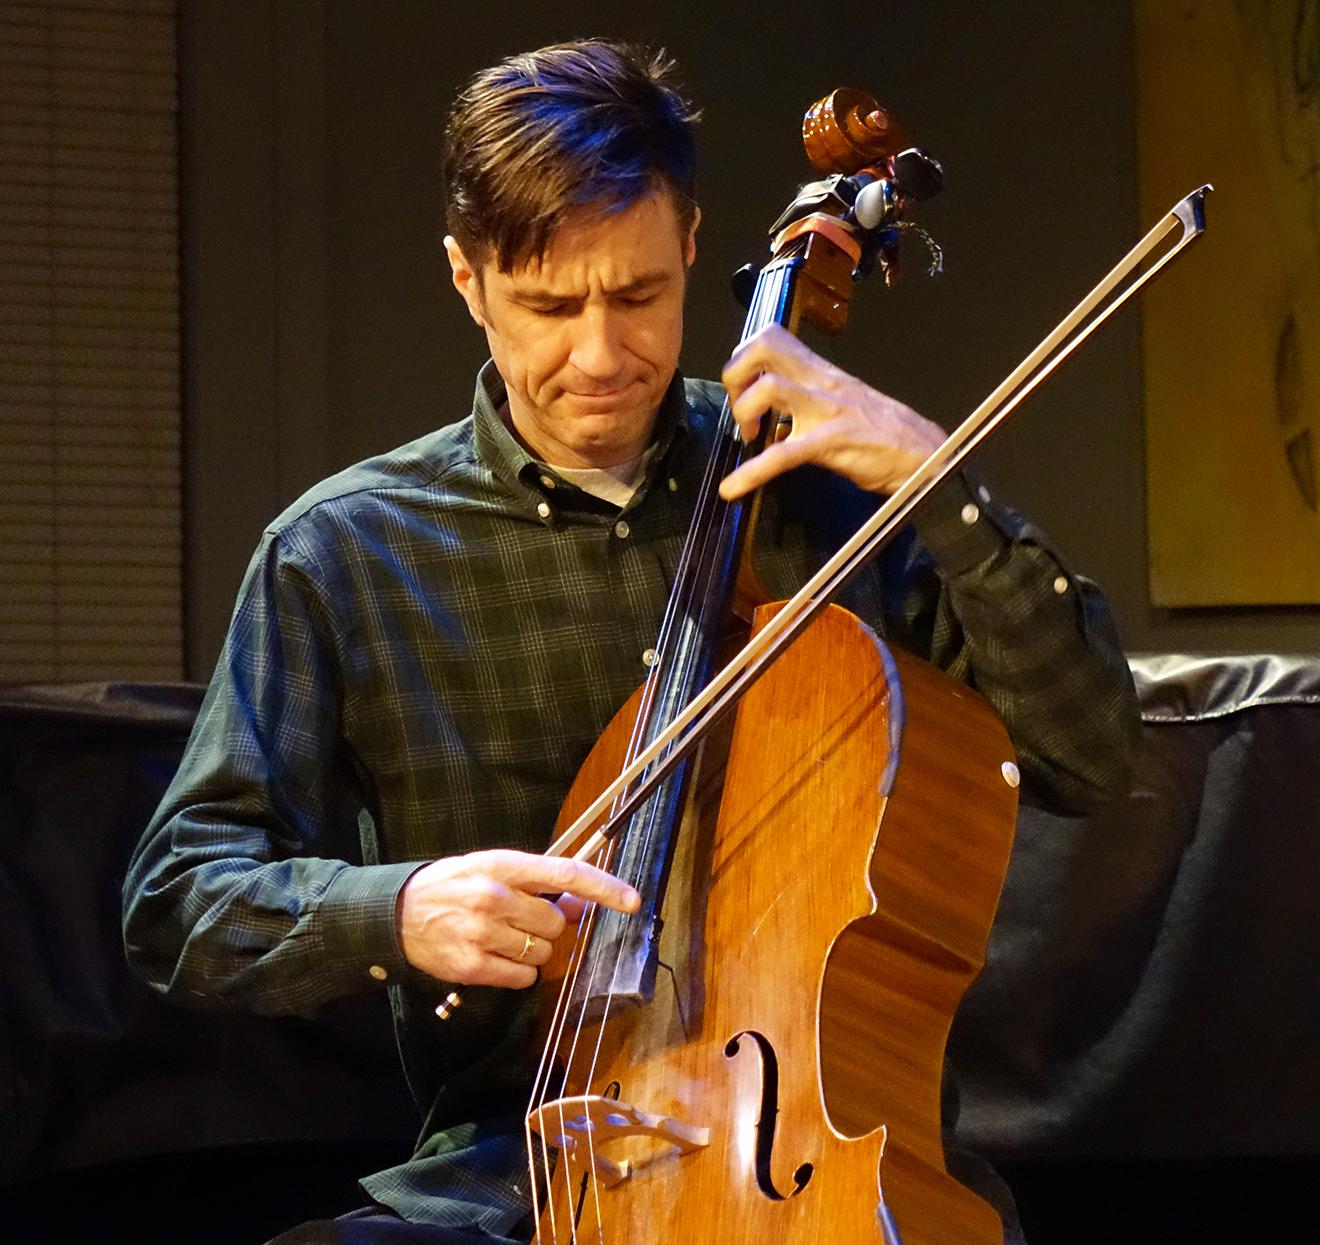 Fred Lonberg-Holm at Edgefest 2015